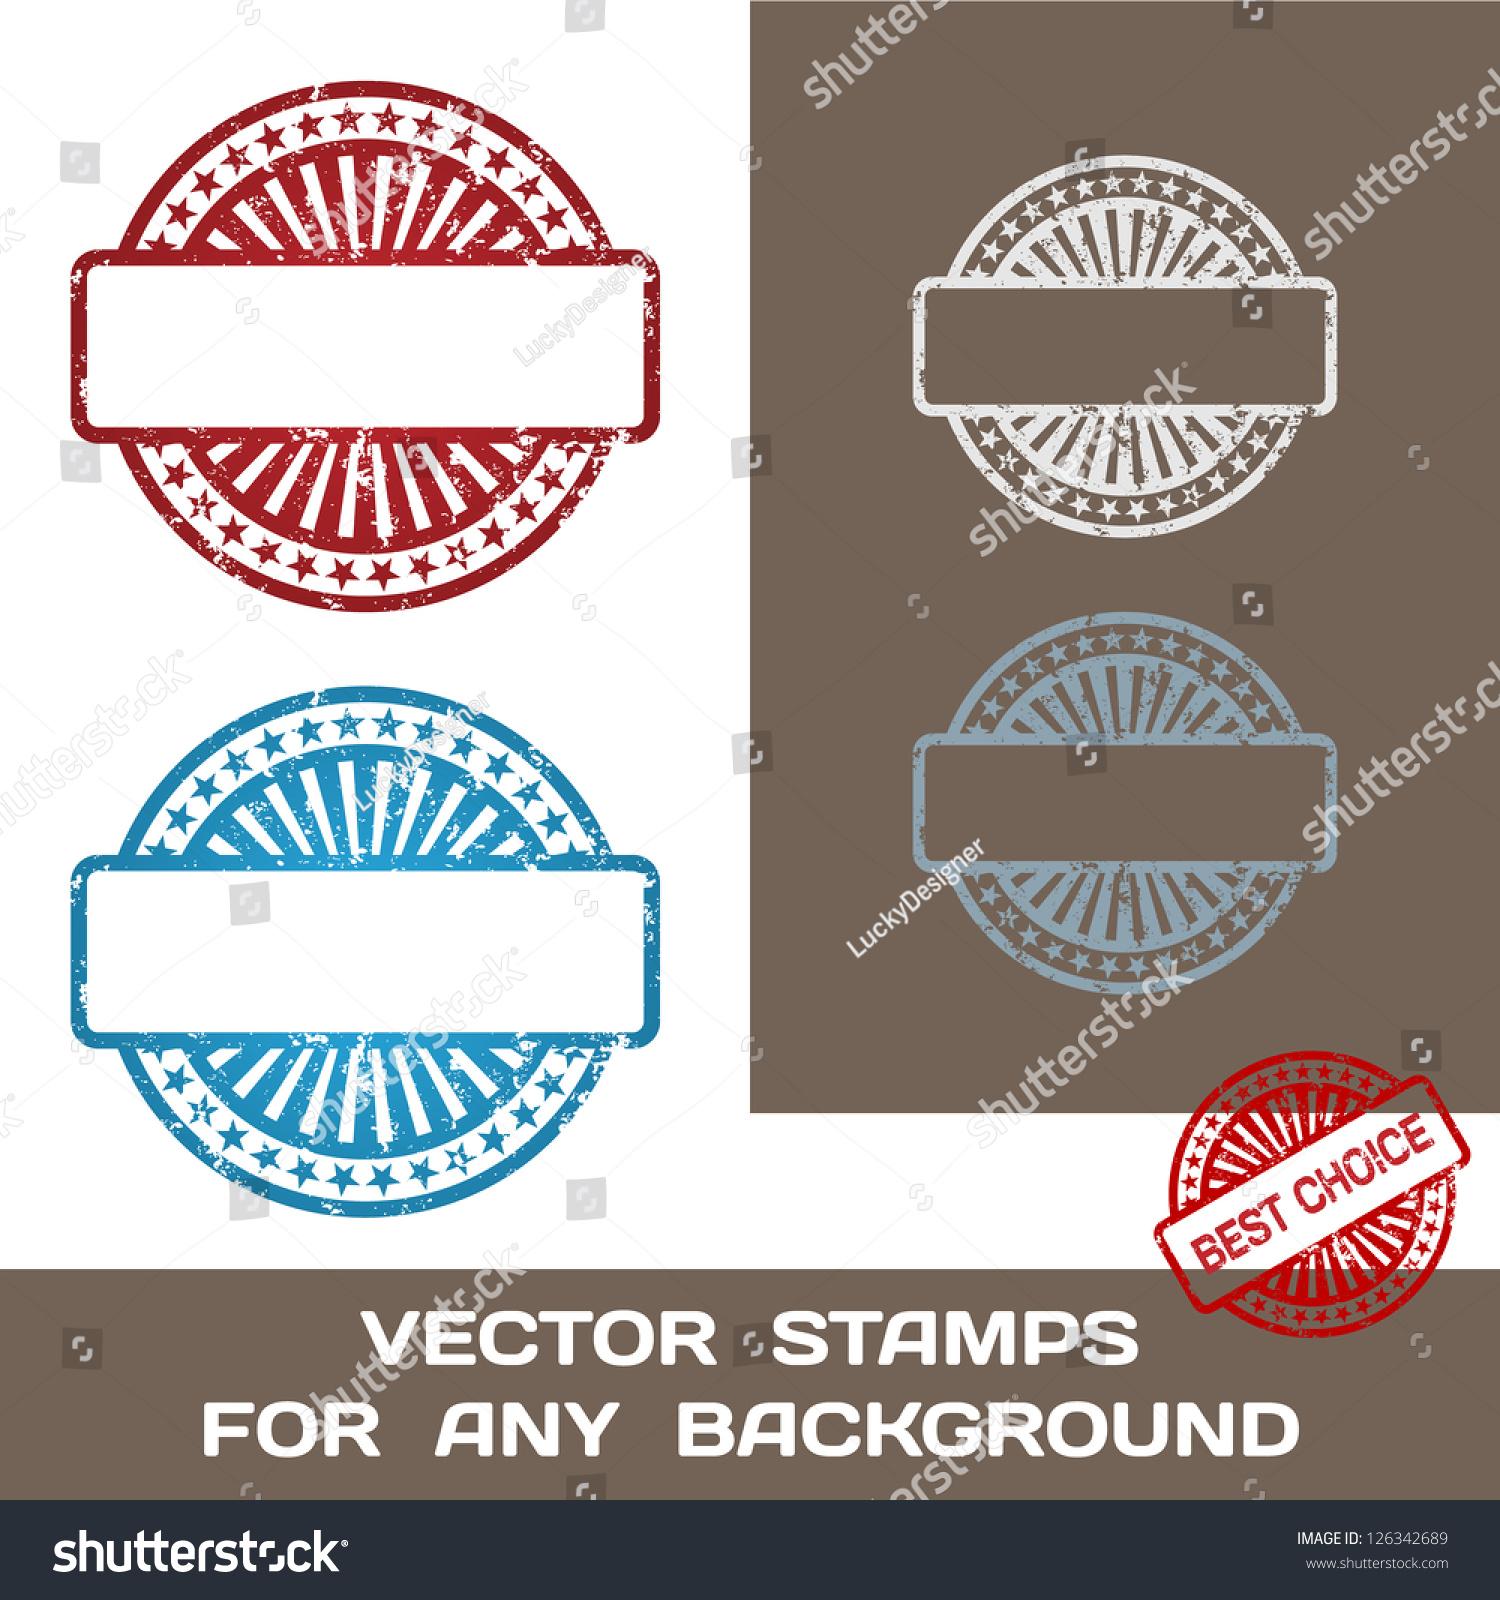 Rubber Stamp Design Template